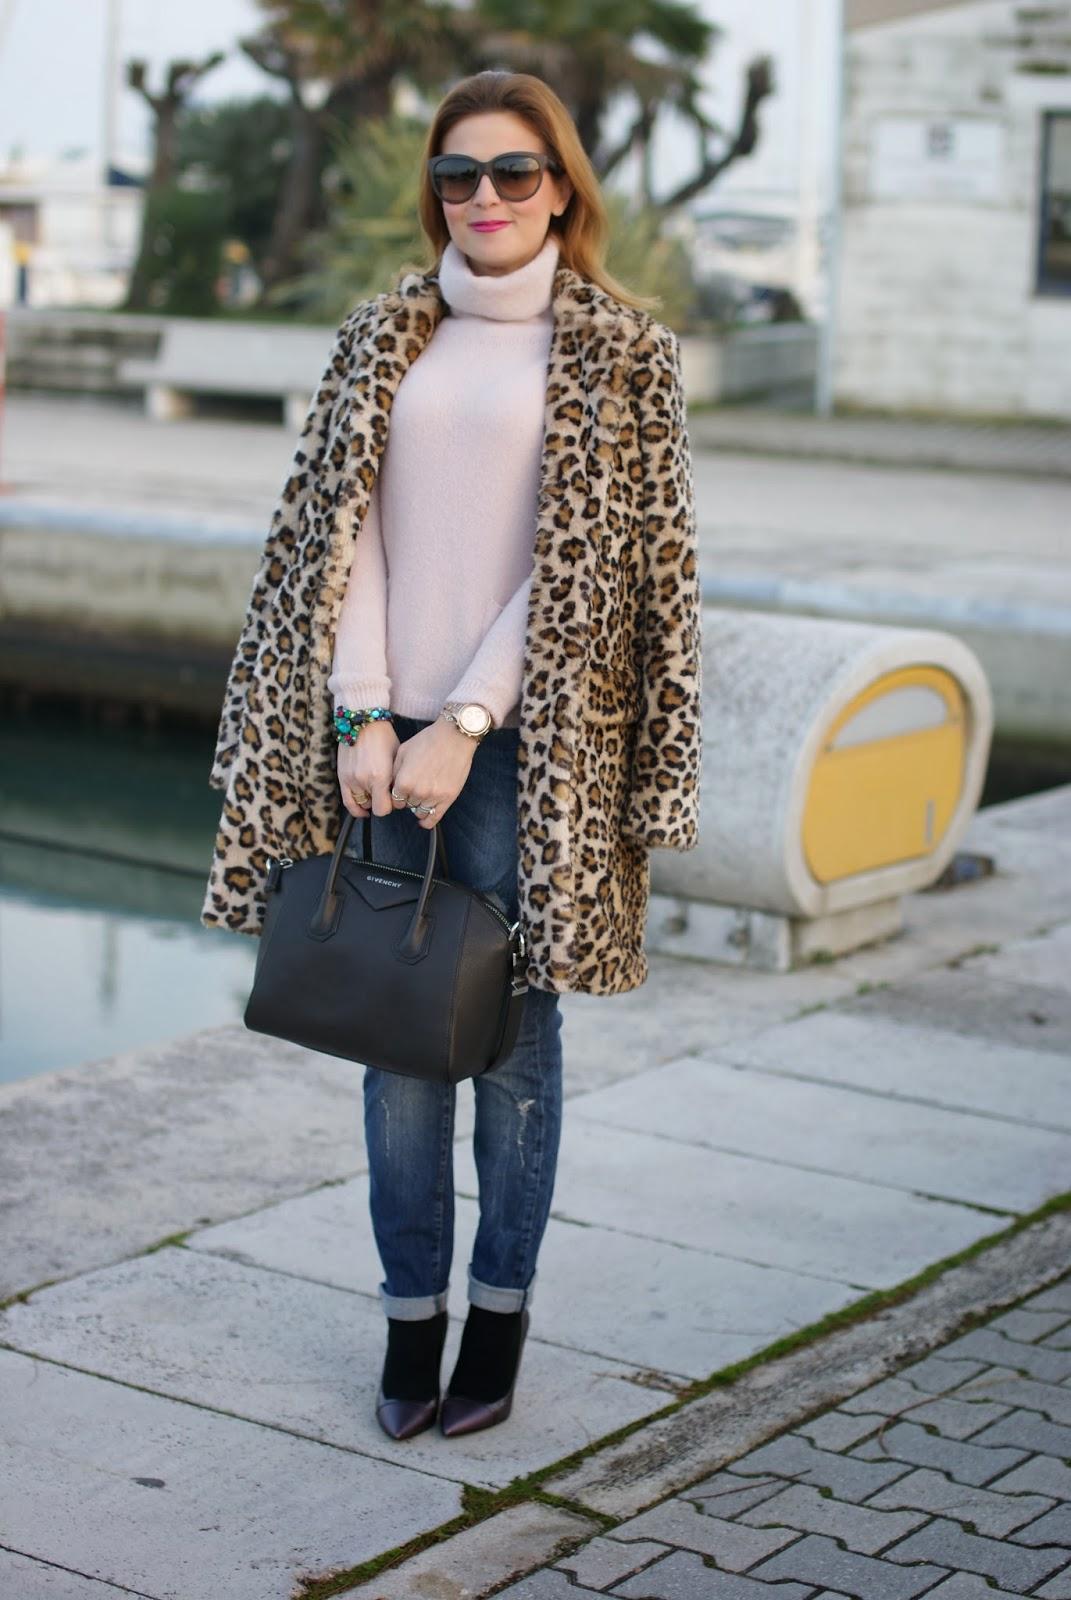 zara leopard coat, leopard faux fur coat, pink sweater, fabi heels, givenchy antigona bag, fashion and cookies, fashion blogger